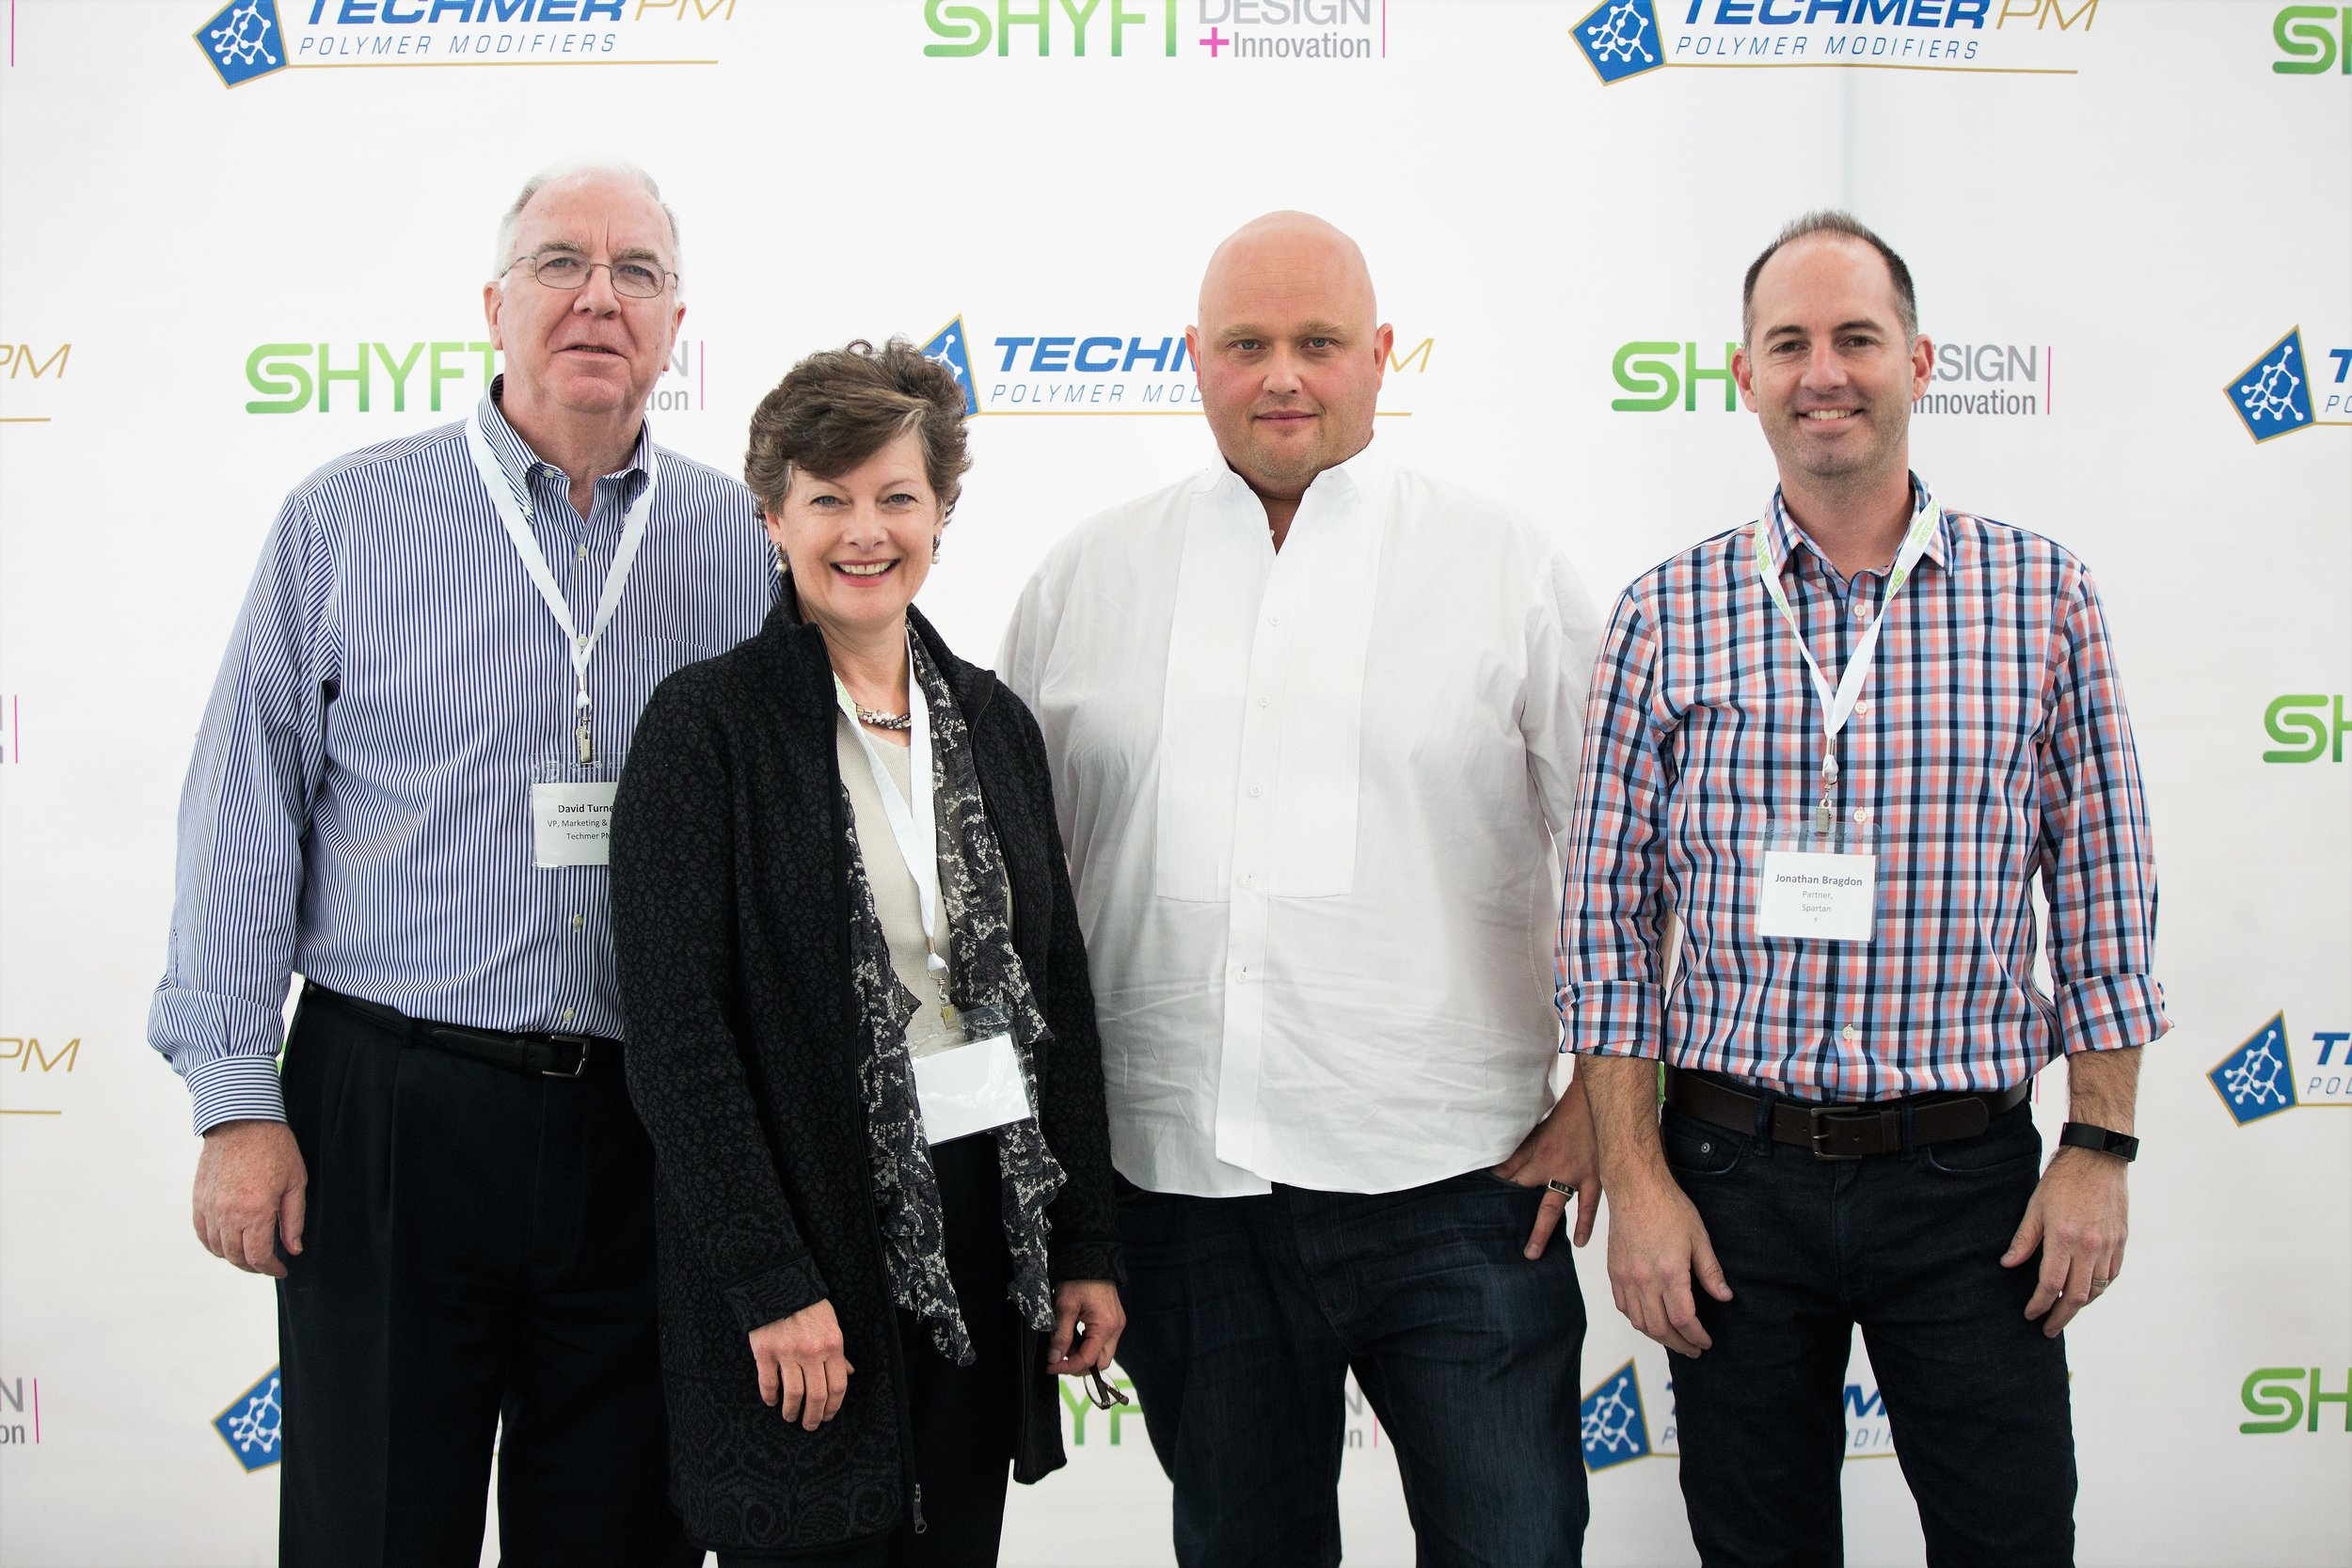 David Turner, Jenny Whitener, and Marc Shillum